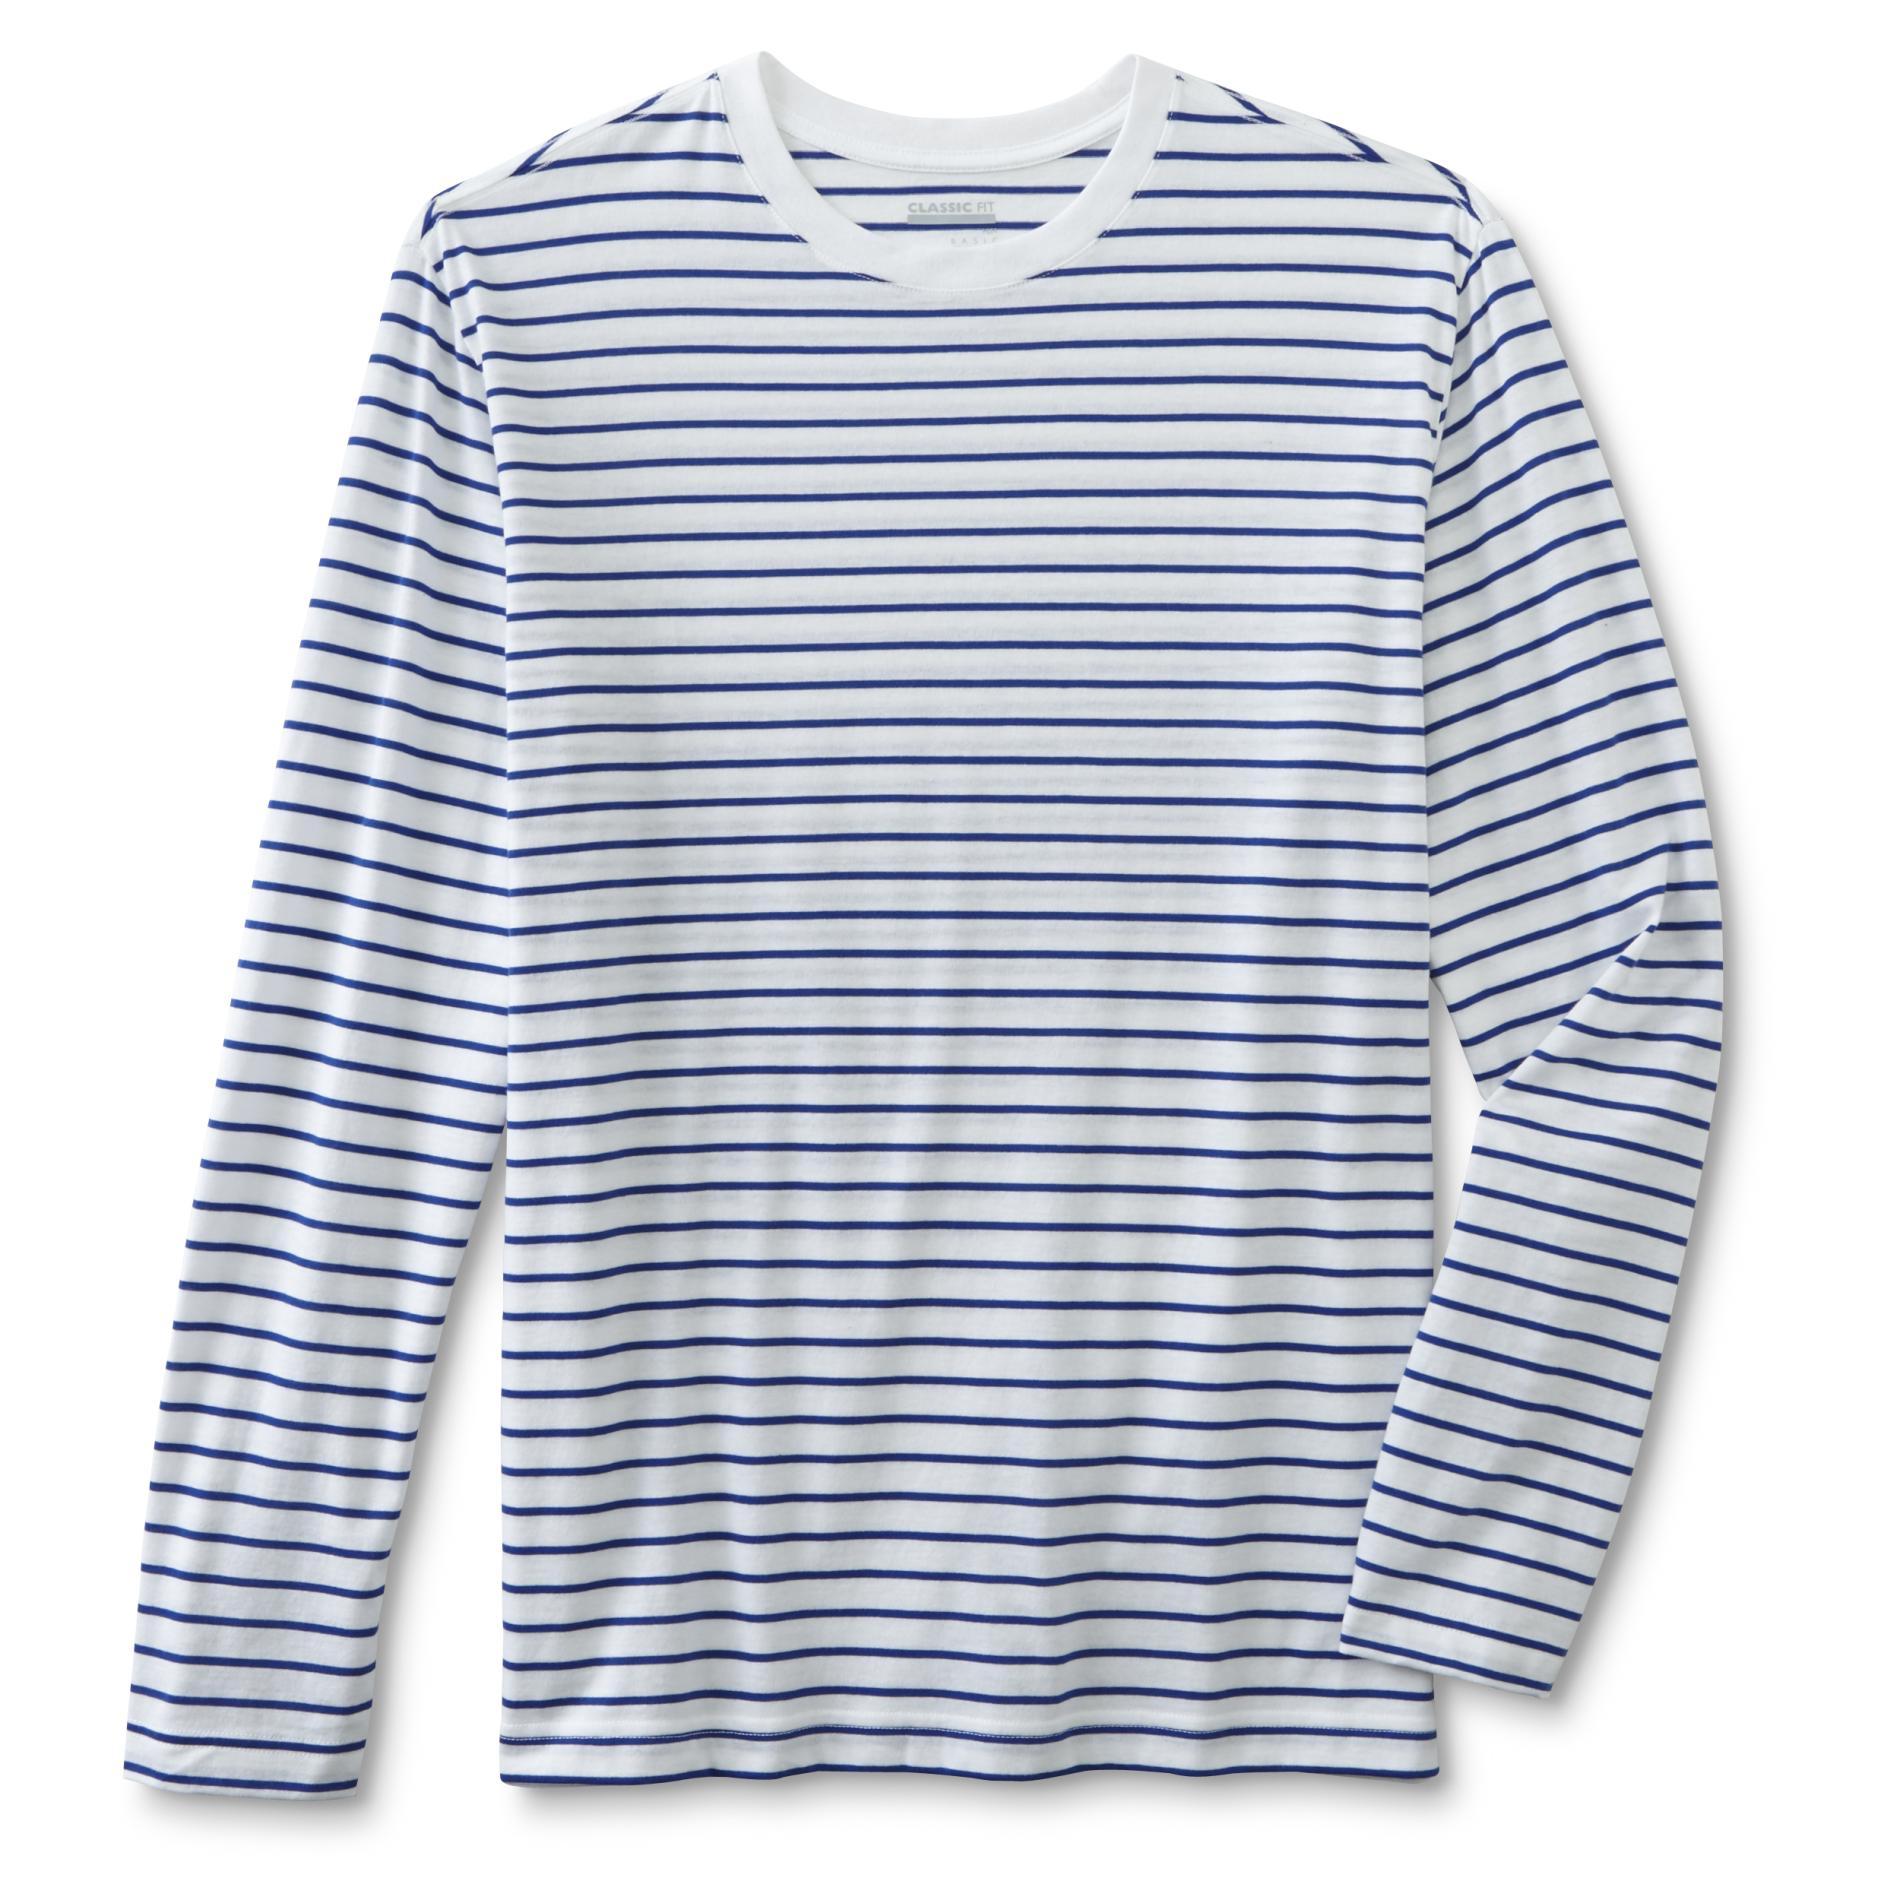 Basic Editions Men's Long-Sleeve T-Shirt - Striped